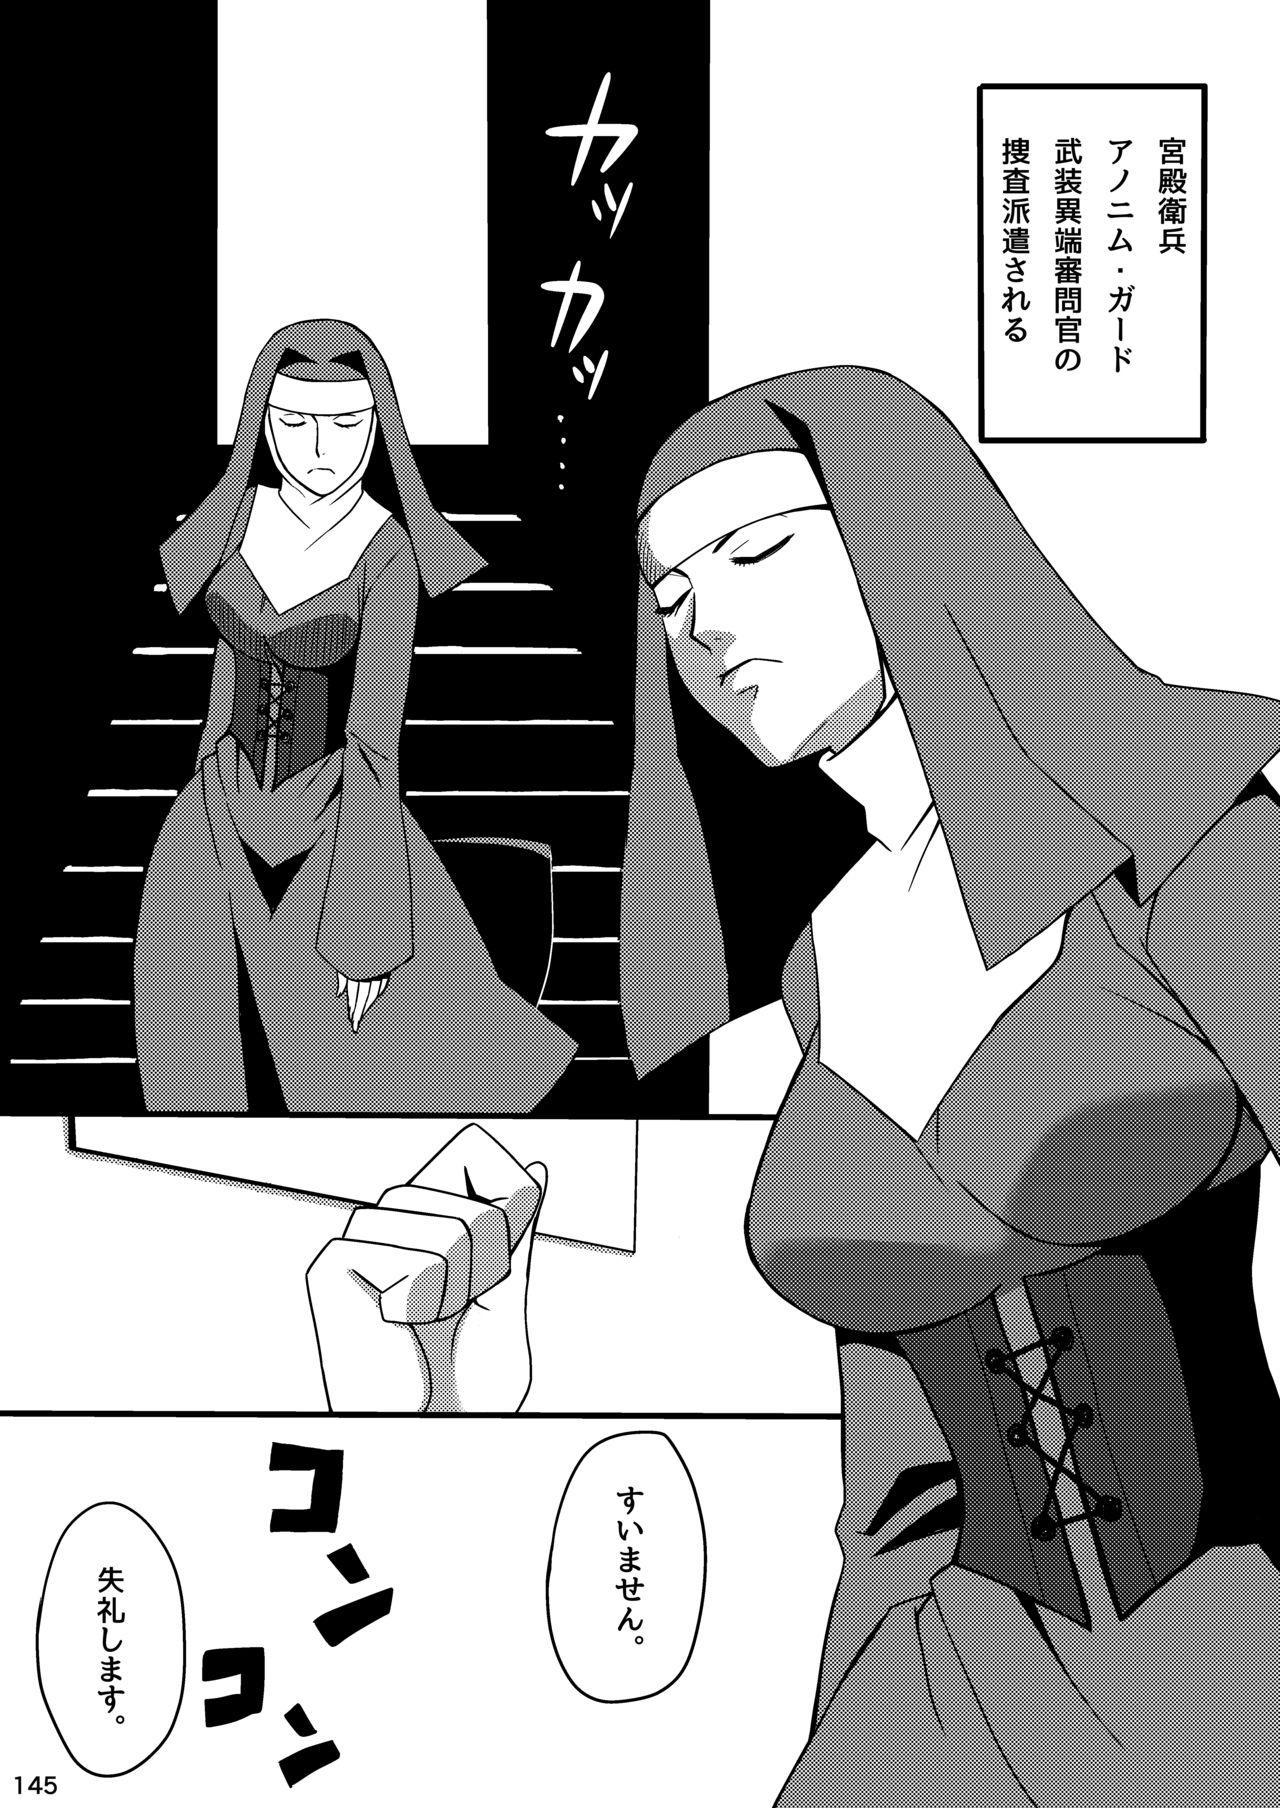 Akatsuki Blitzkampf & EN-1 Perfekt Welt Gangbang Anthology 144